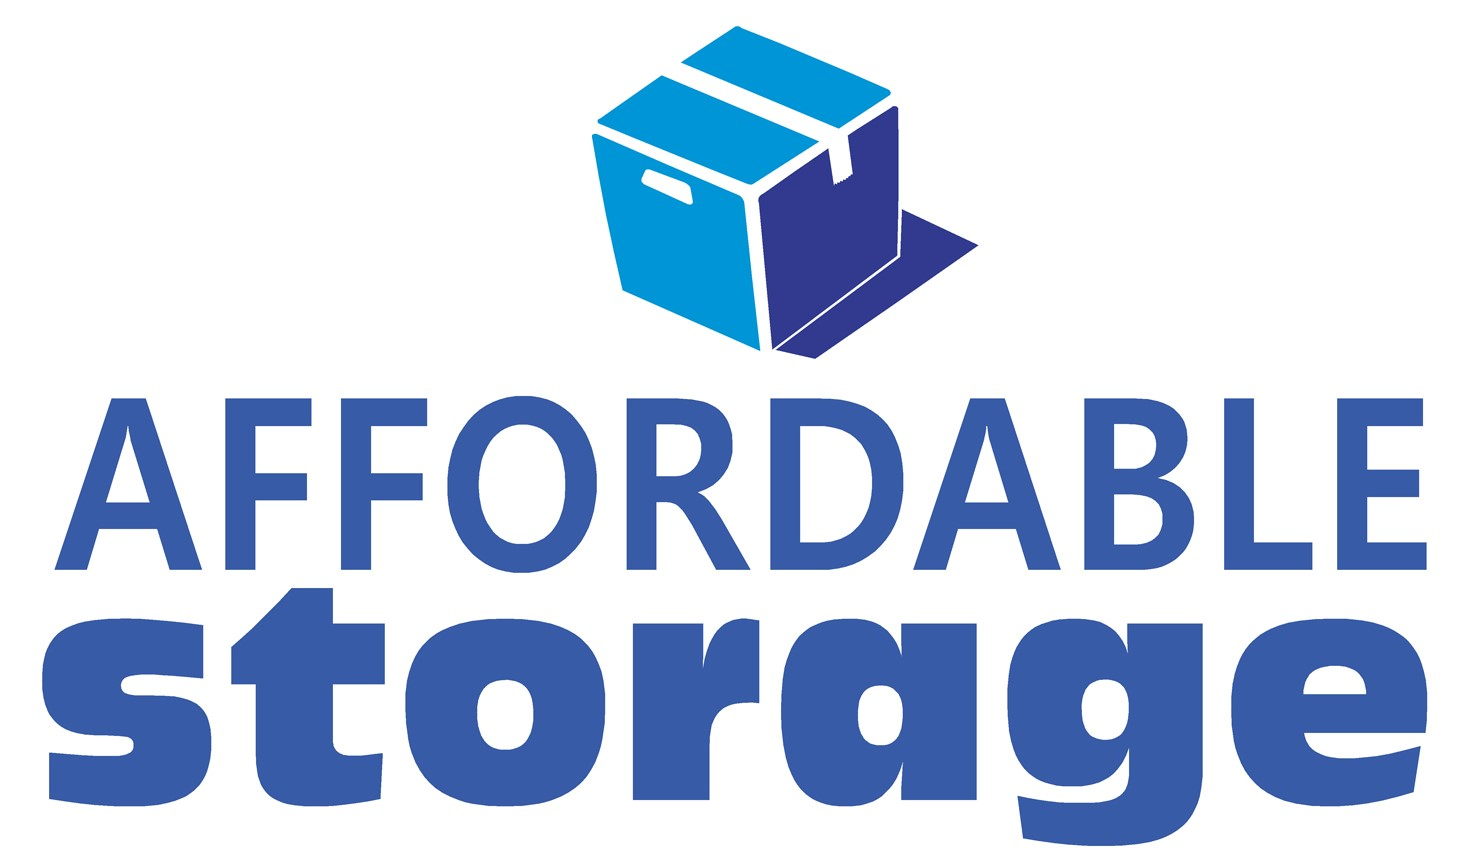 Affordable Self-Storage